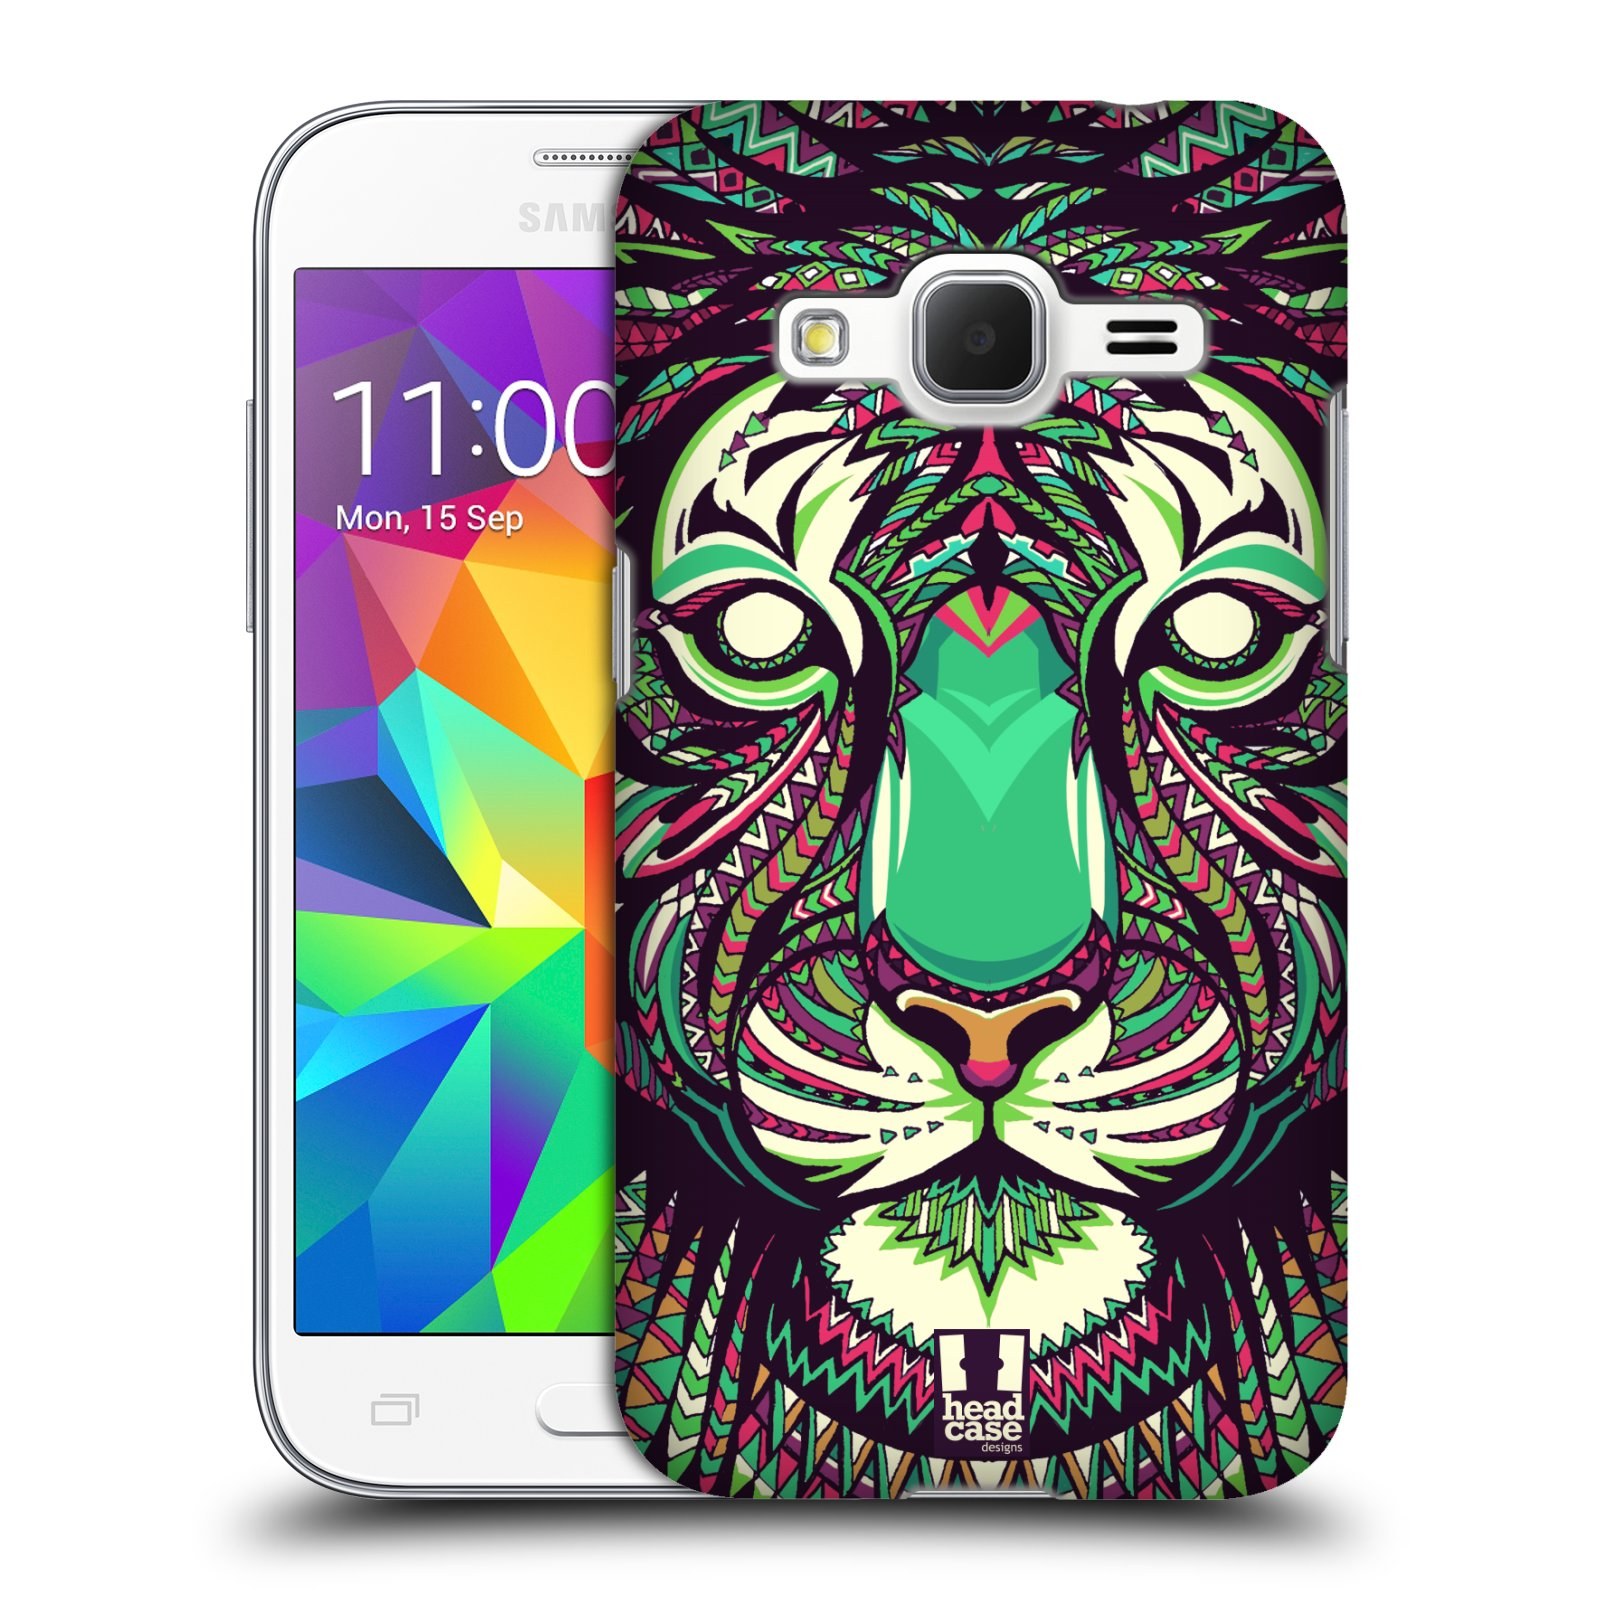 Plastové pouzdro na mobil Samsung Galaxy Core Prime VE HEAD CASE AZTEC TYGR (Kryt či obal na mobilní telefon Samsung Galaxy Core Prime LTE VE SM-G361F)